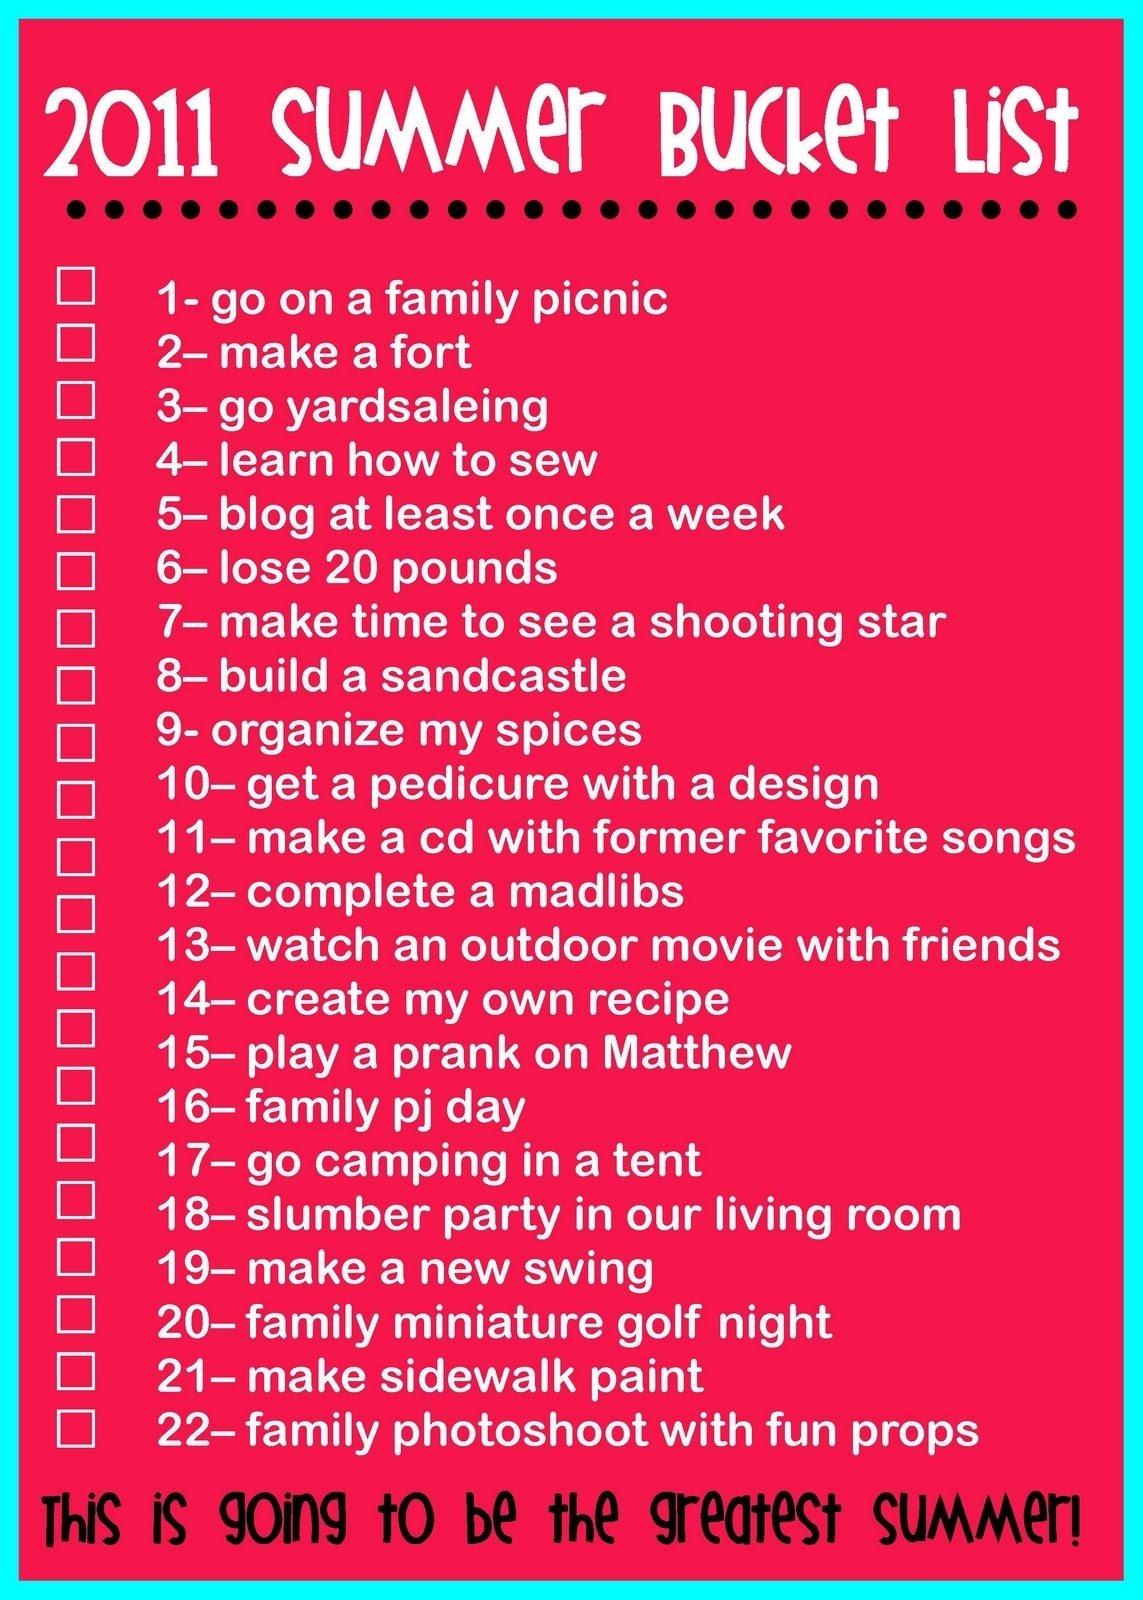 10 Attractive Fun Summer Bucket List Ideas the rollins family 2011 summer bucket list summer lists 3 2020